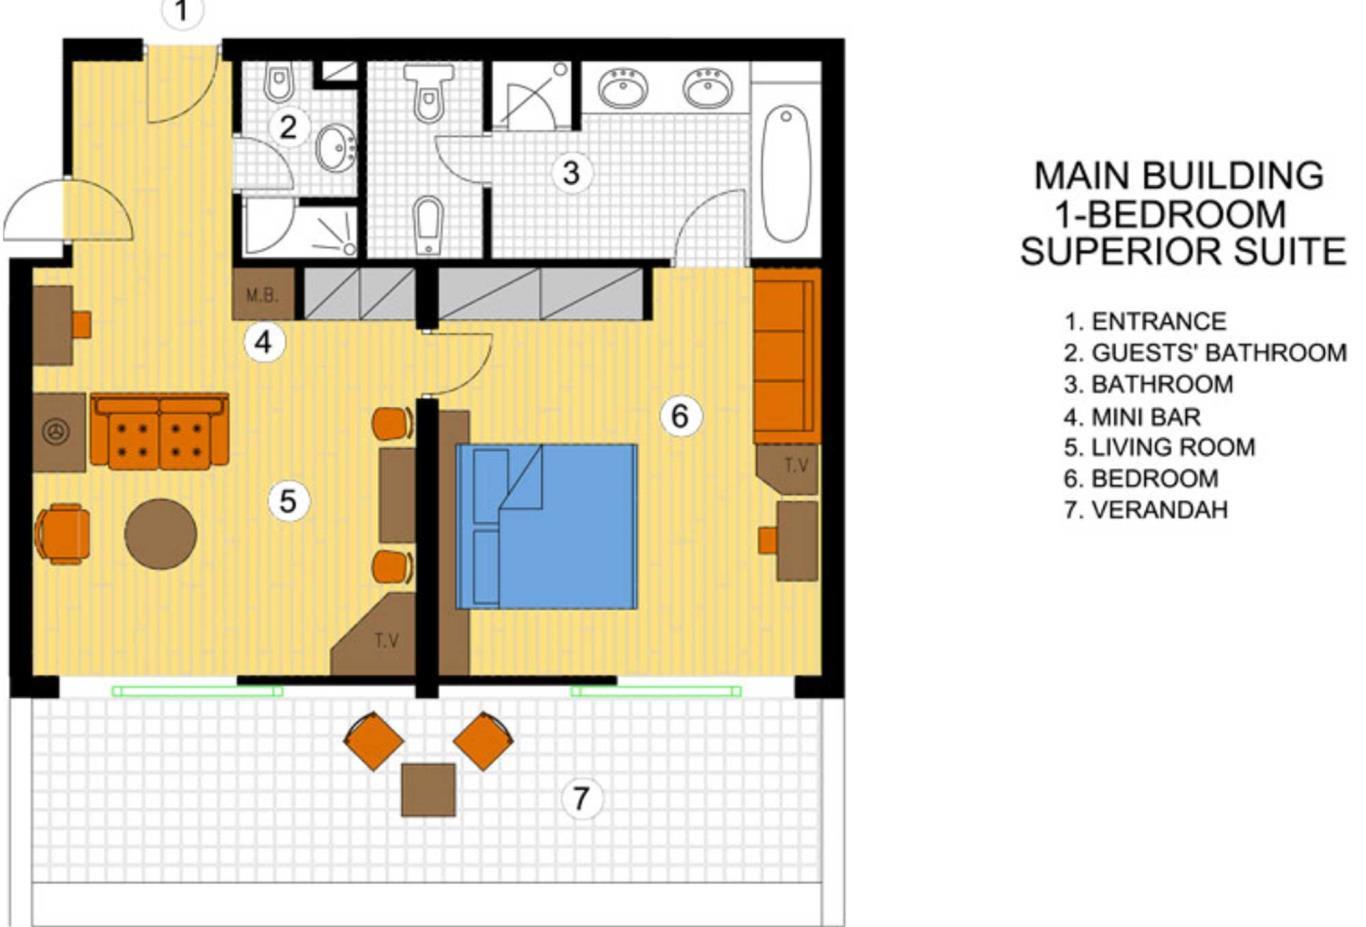 One Bedroom Superior Suite floorplan